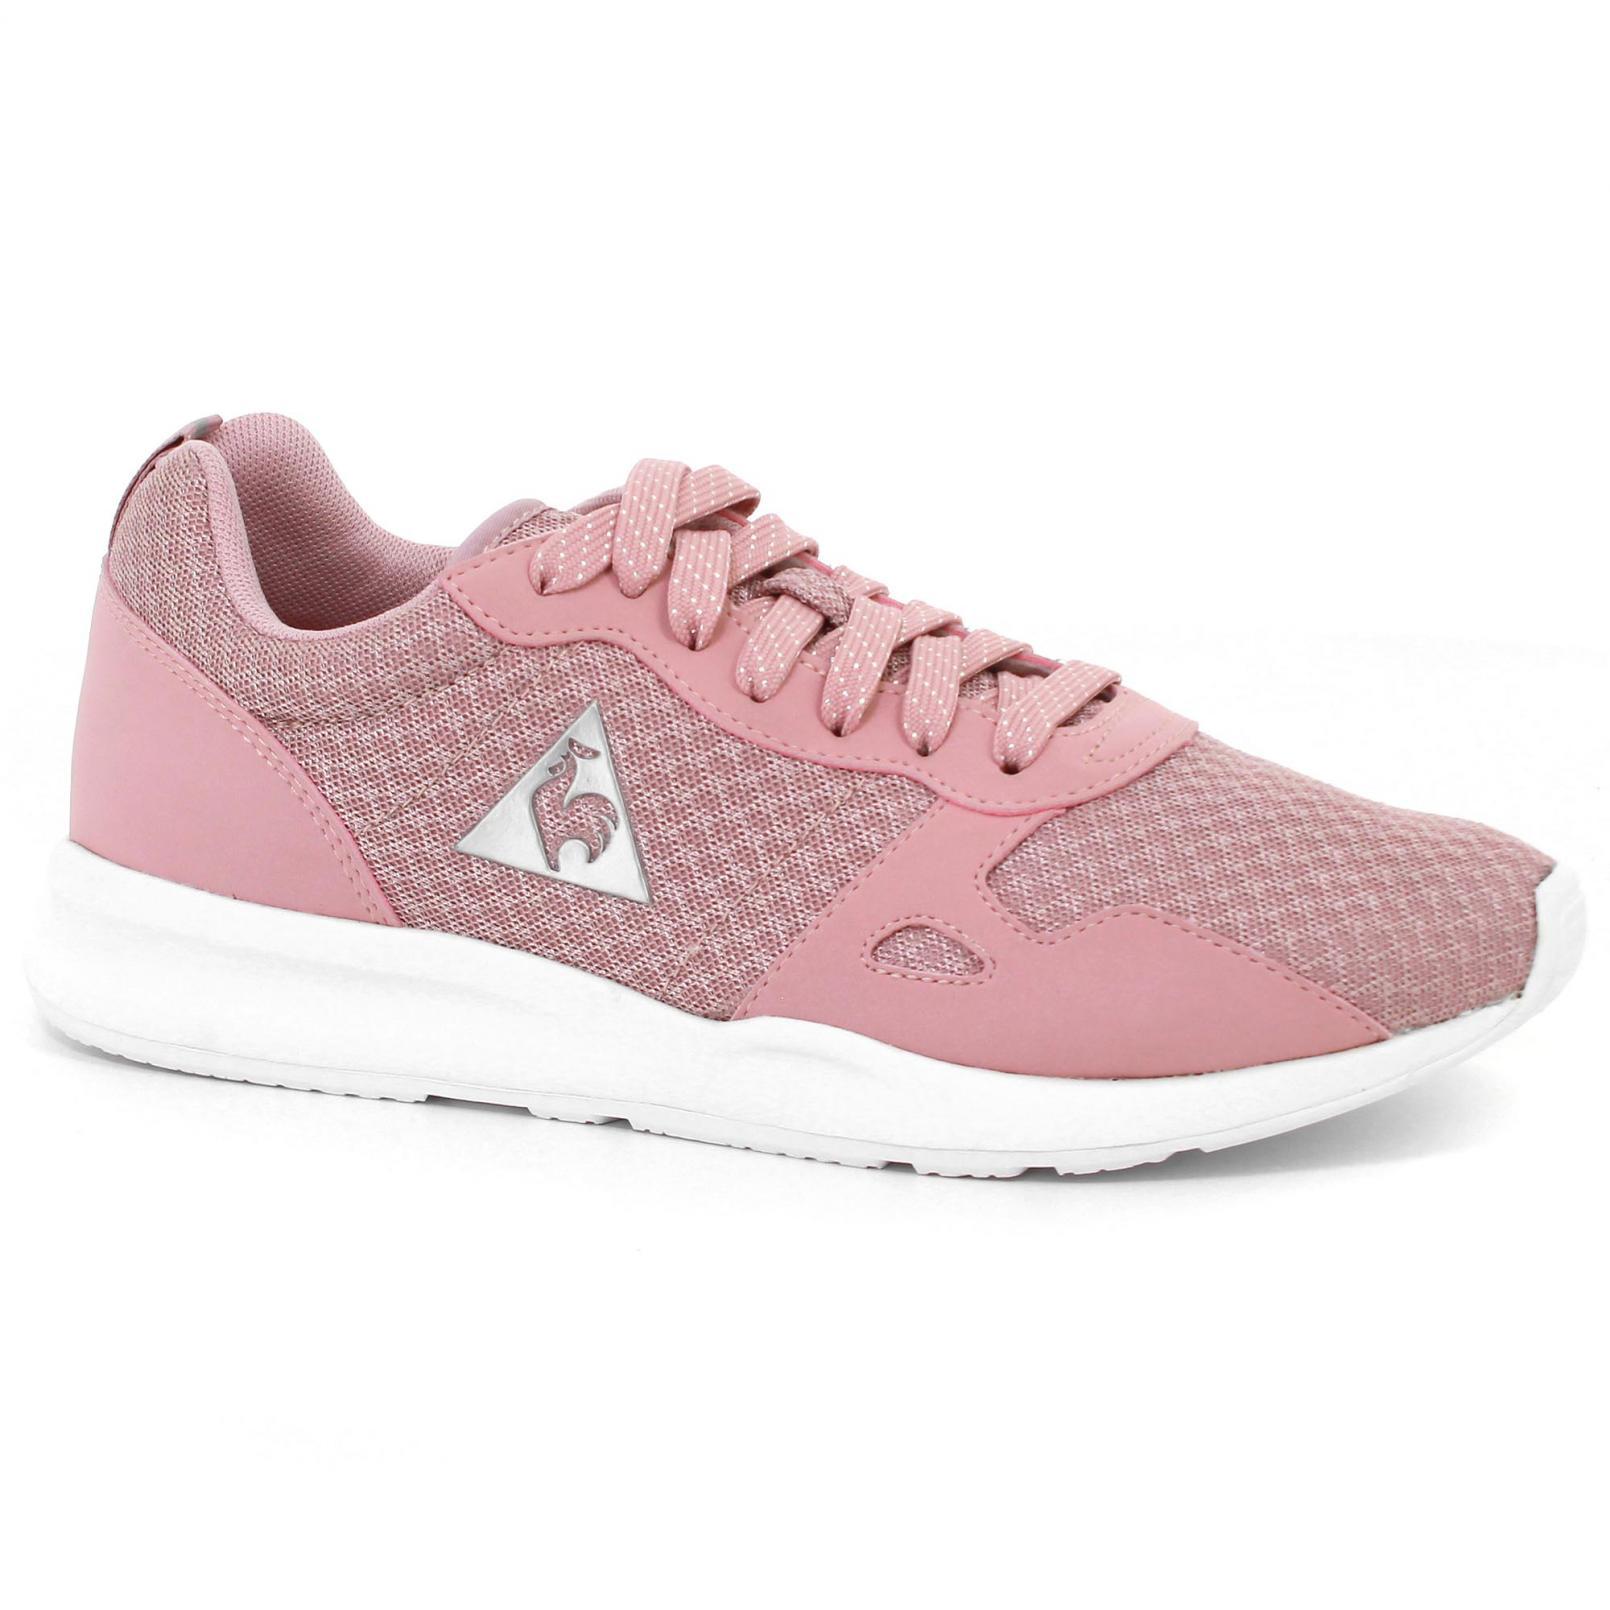 Shoes – Le Coq Sportif Lcs R600 W Feminine Mesh/S Nubuck Pink/Grey